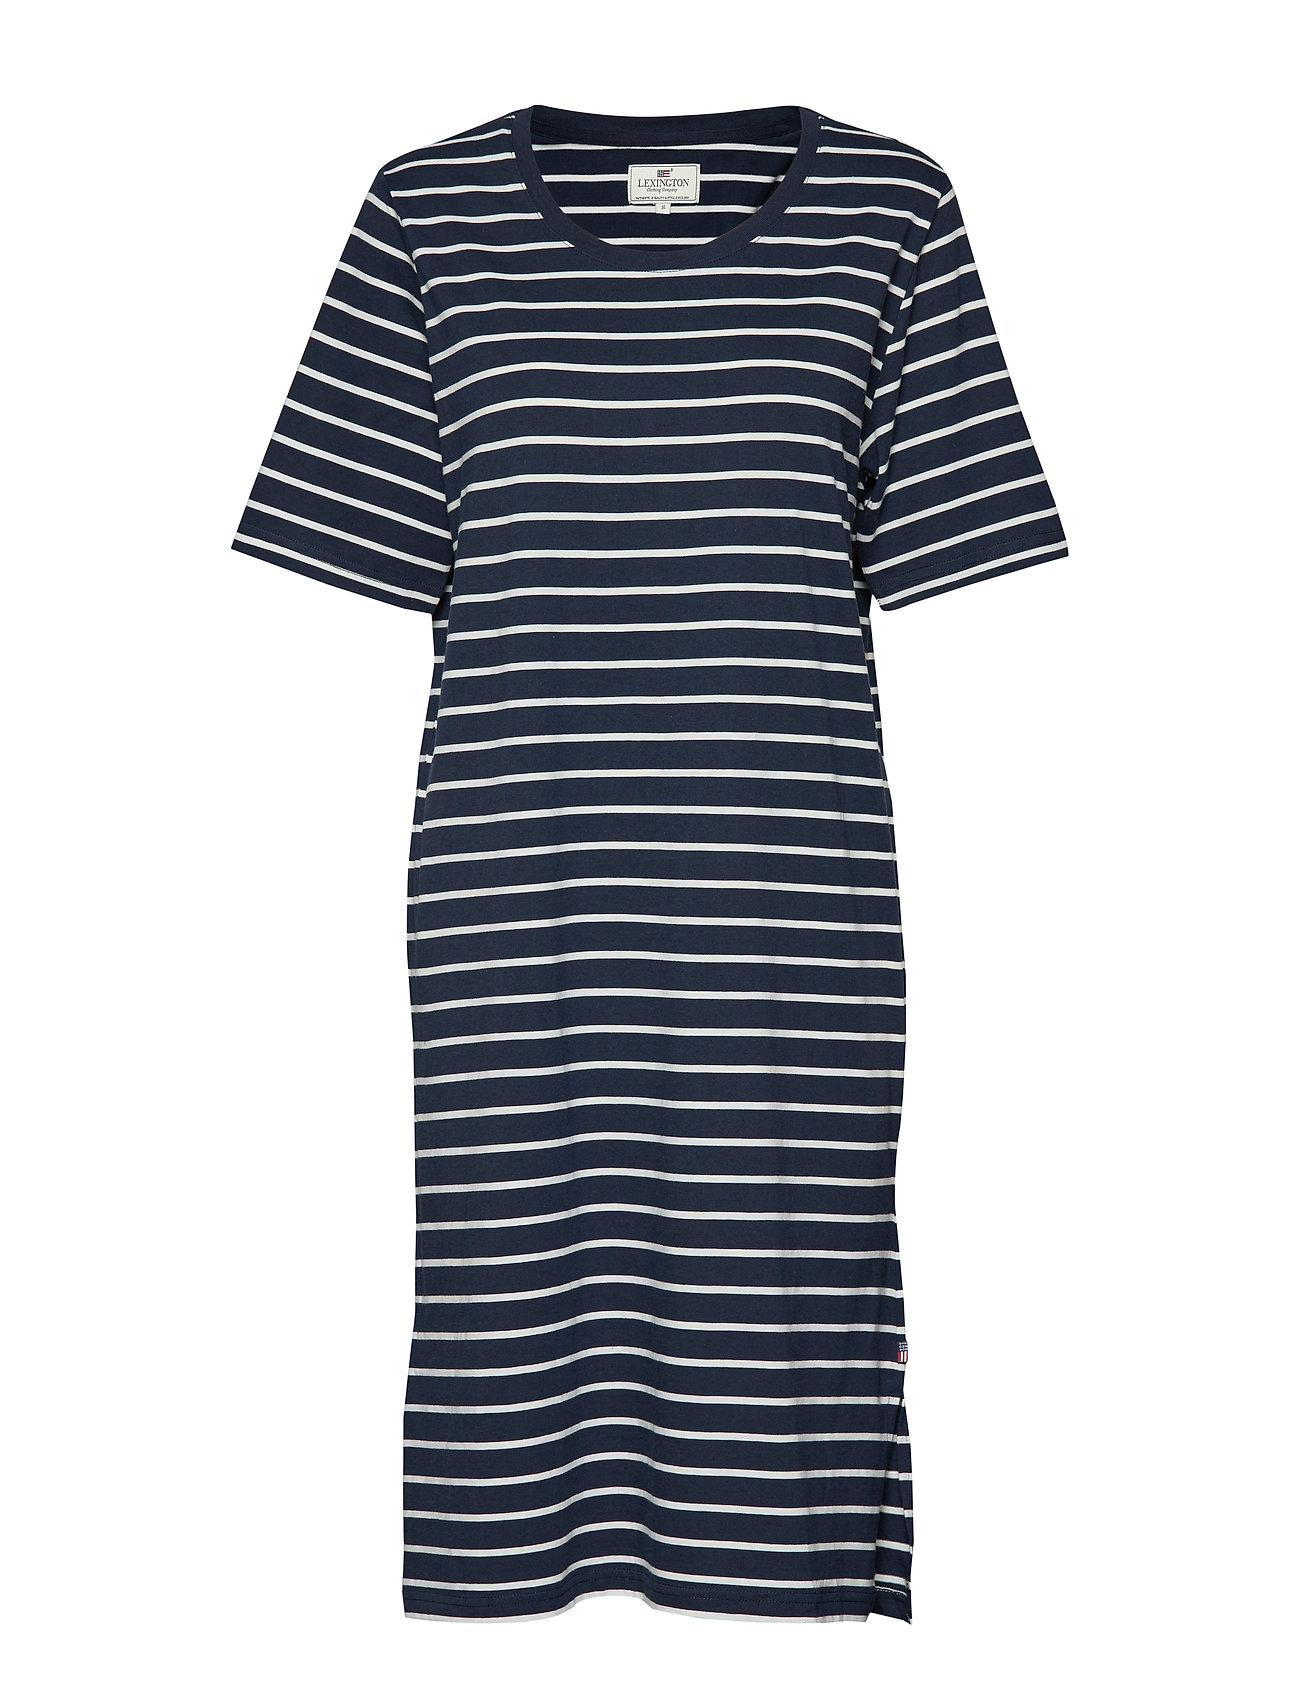 Lexington Clothing Blossom Dress - BLUE/WHITE STRIPE